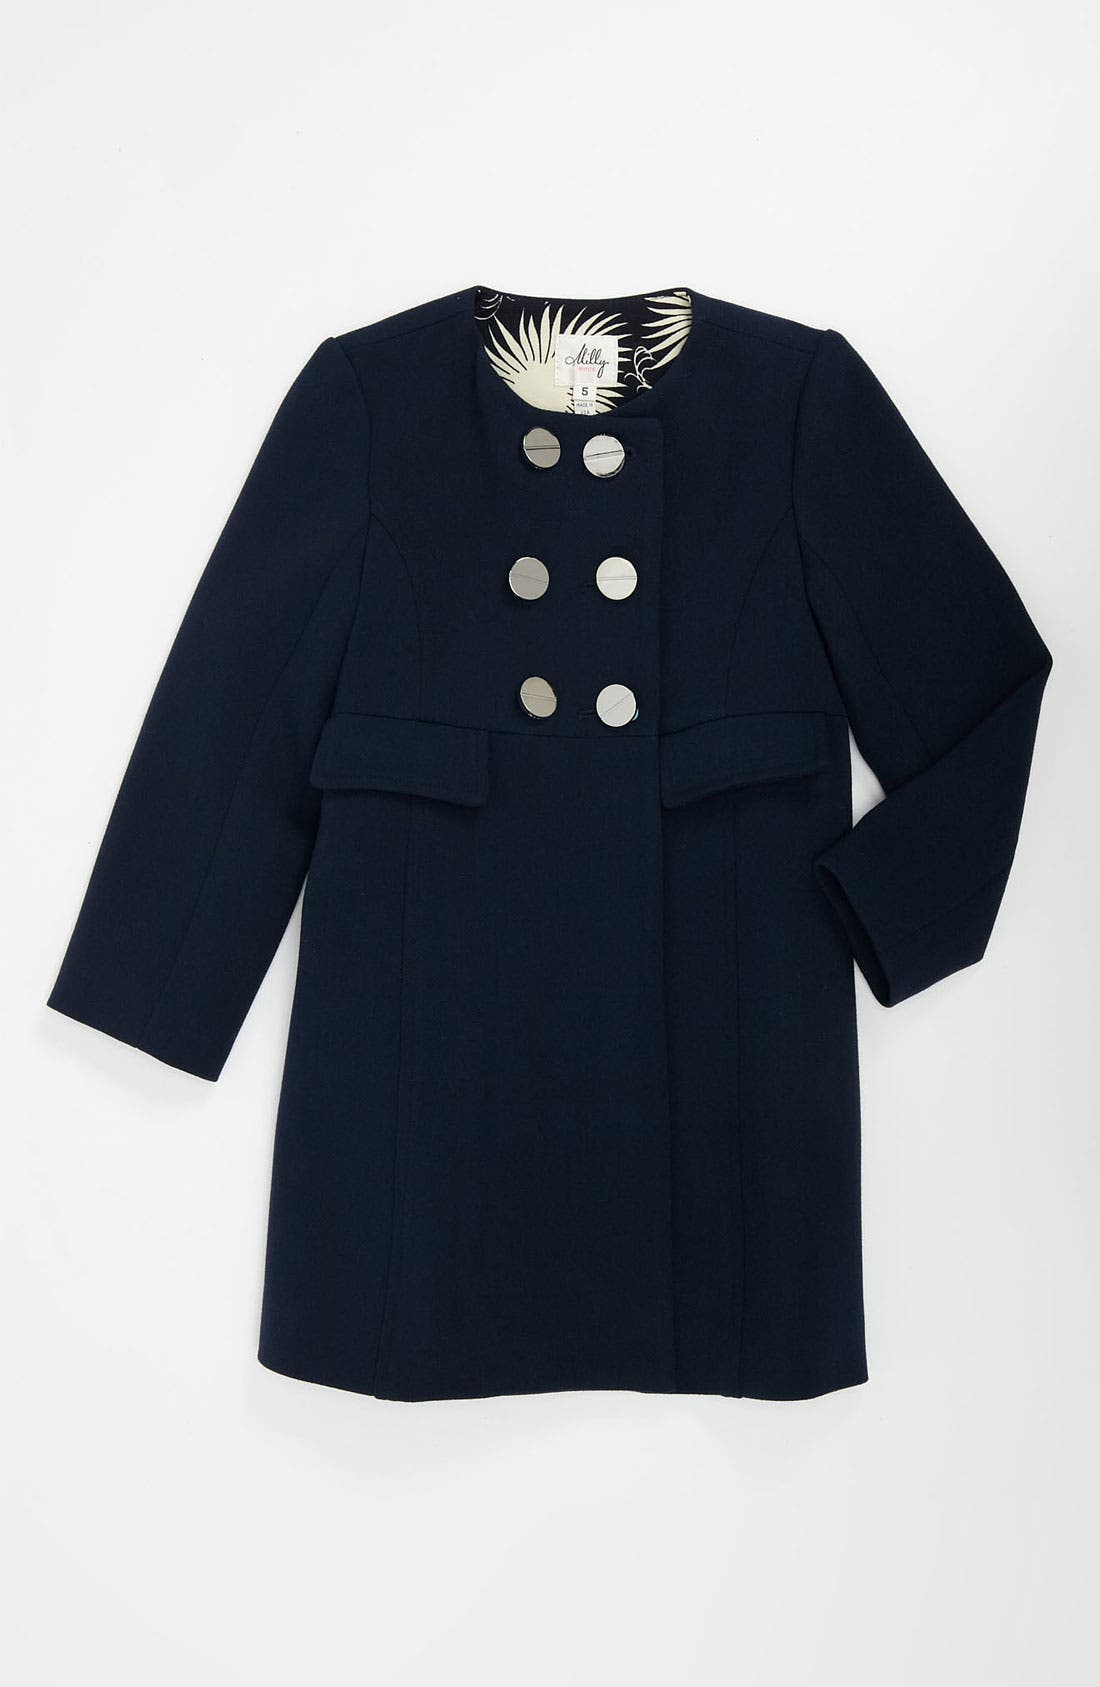 Main Image - Milly Minis Sleeveless Dress & Double Breasted Coat (Little Girls & Big Girls)